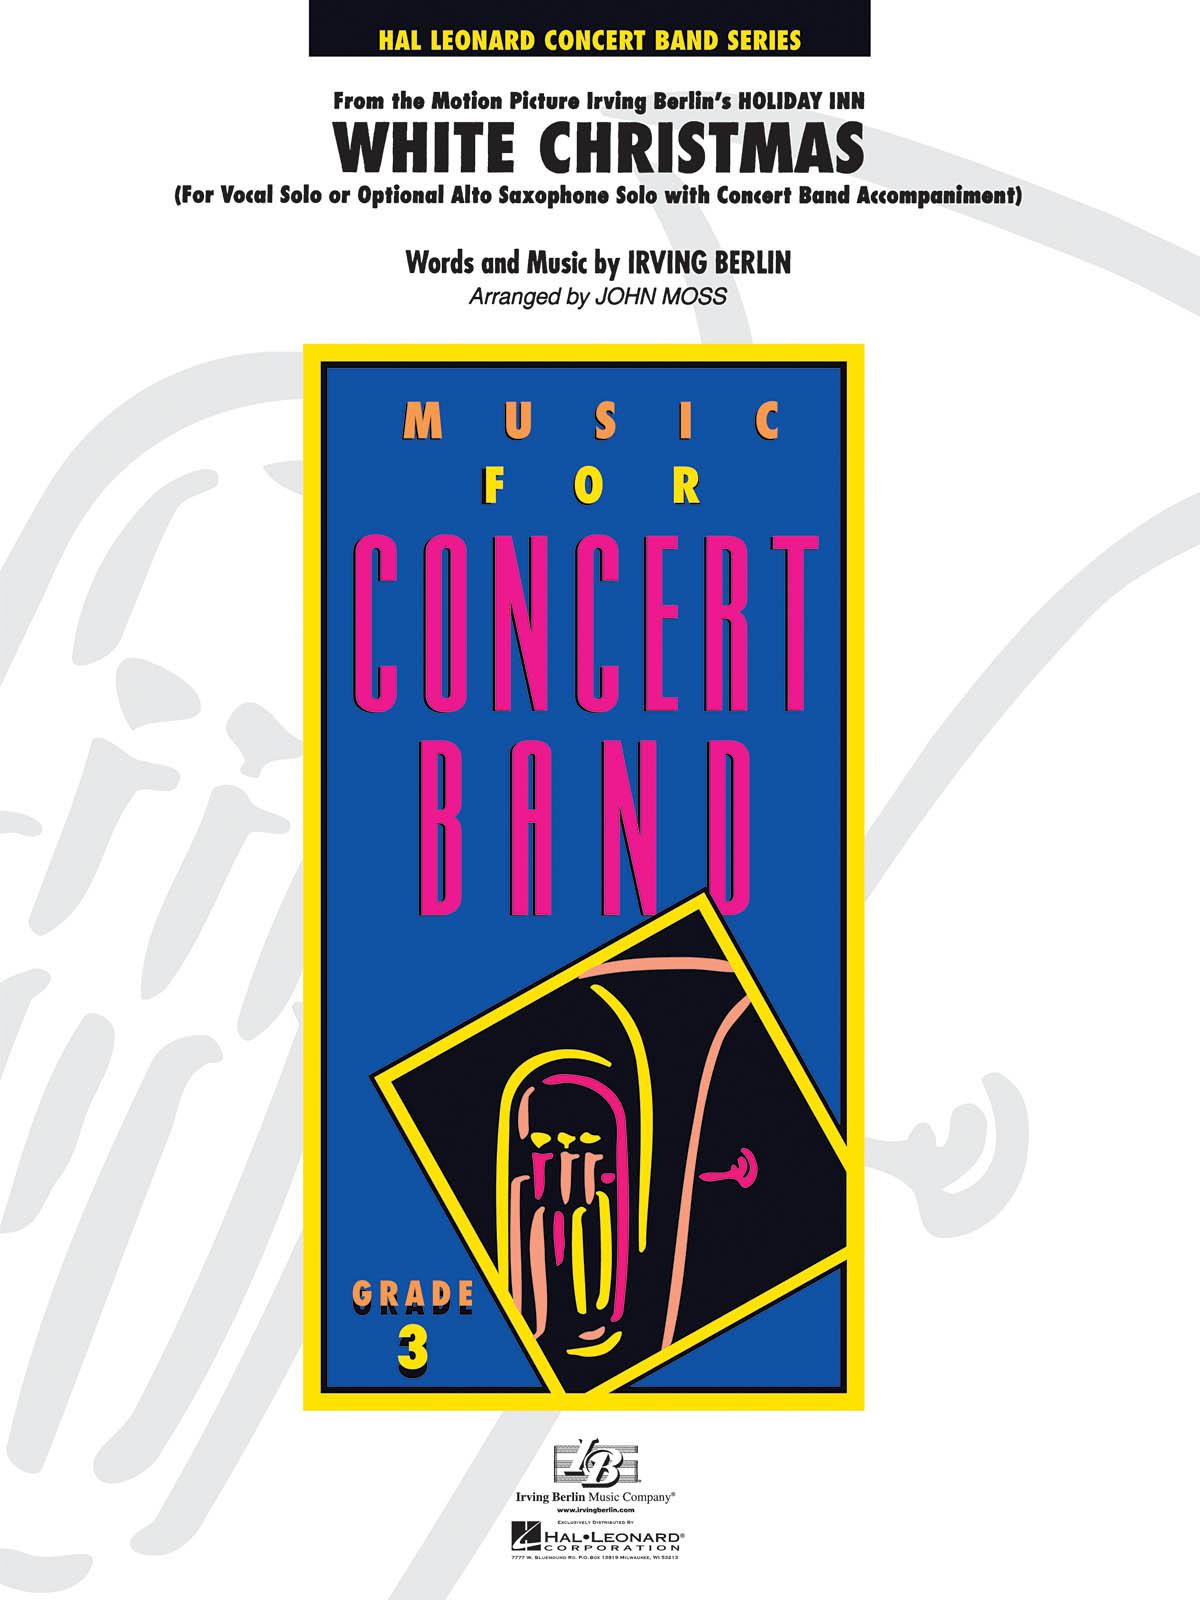 Irving Berlin: White Christmas: Concert Band: Score